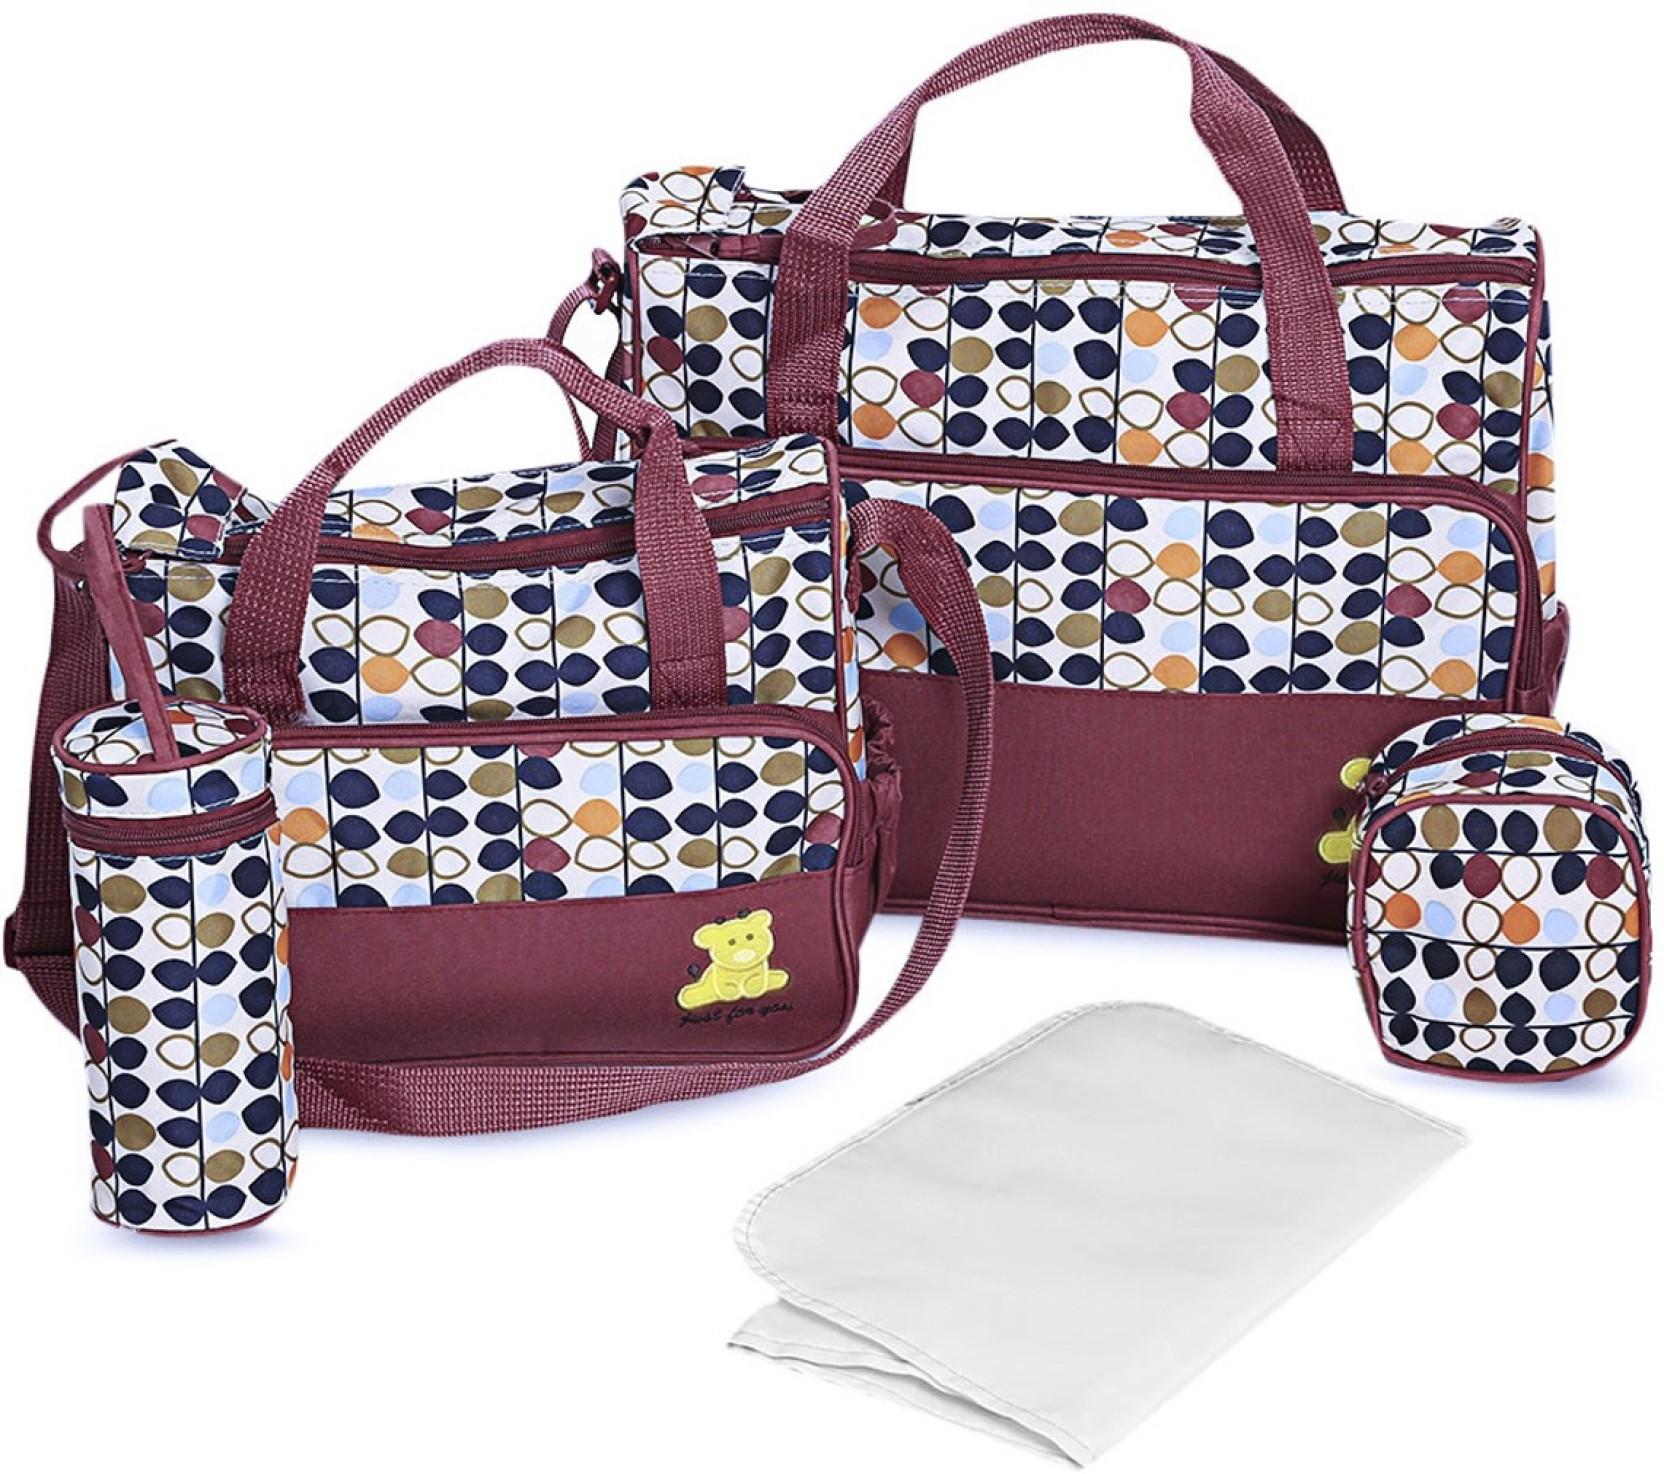 c6733e44 ... Nappy Changing Bag For Travel|Tote Mummy Shoulder Nursing Handbag|  Multi Storage Large Capacity Maternity Bags For Mom Mutli Storage Diaper ...